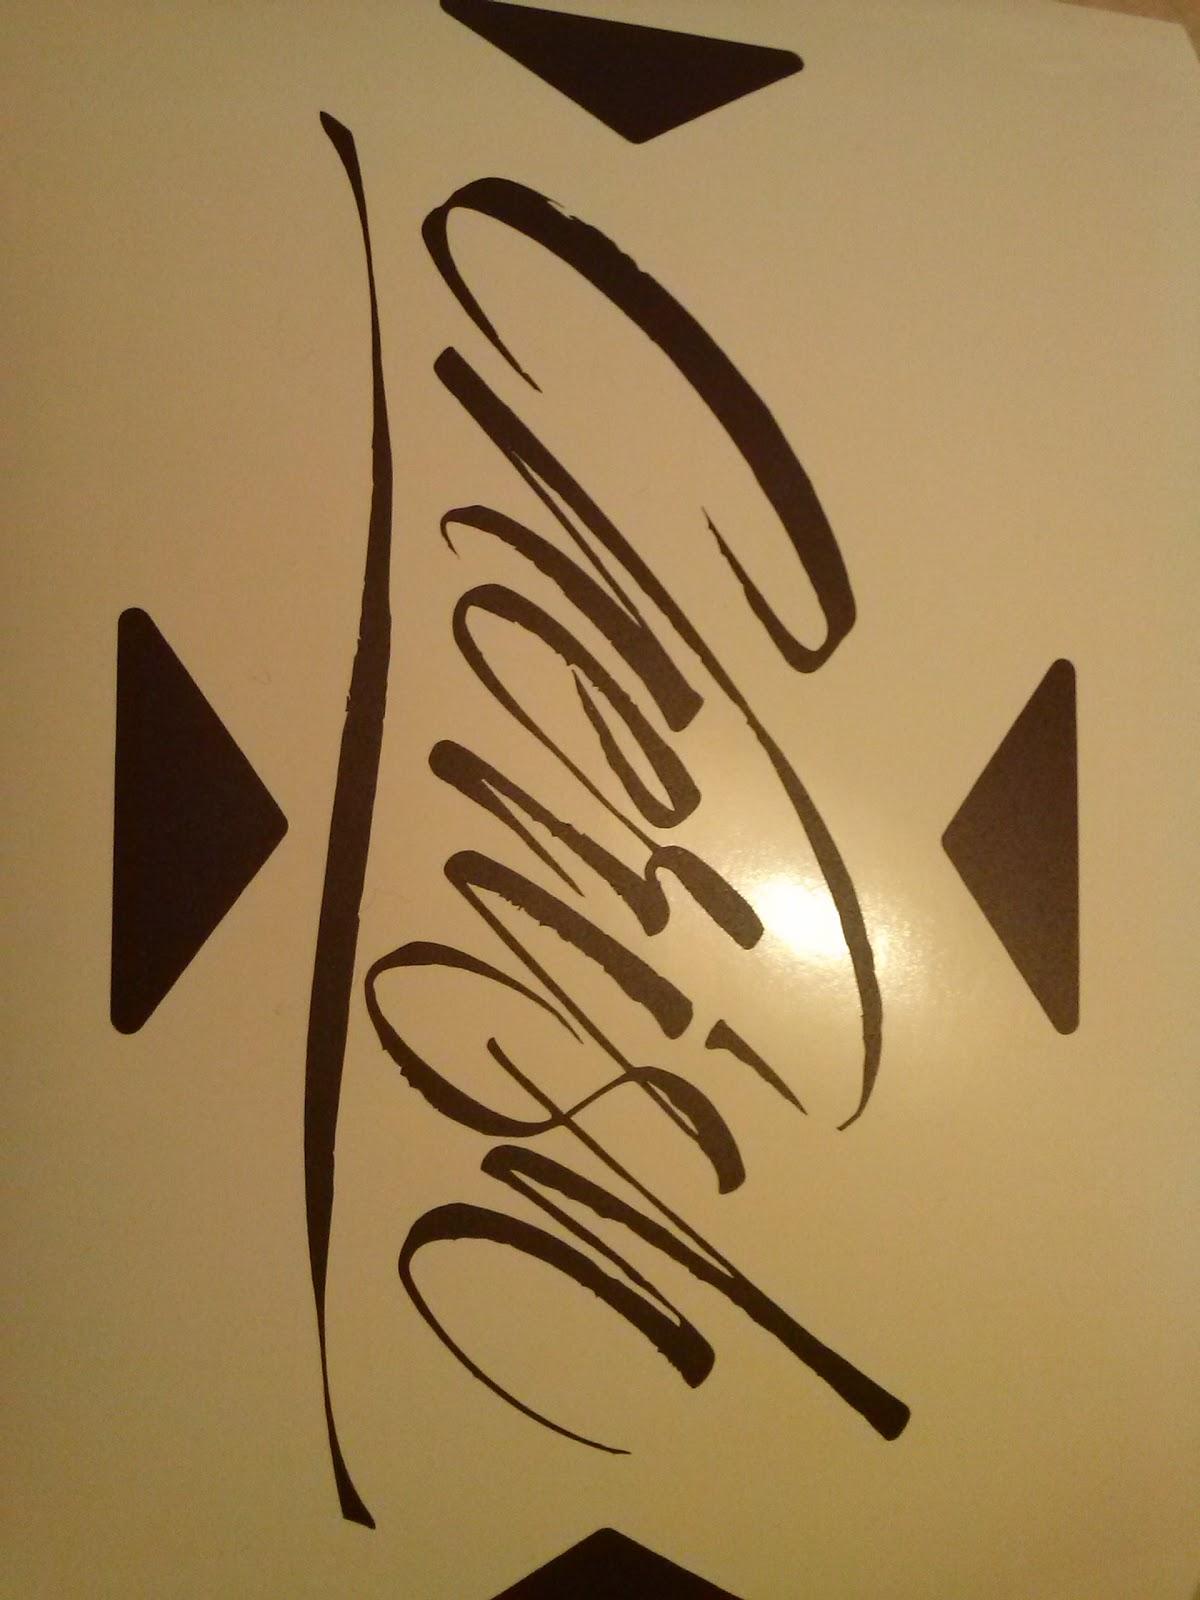 cherish vinyl wall decal